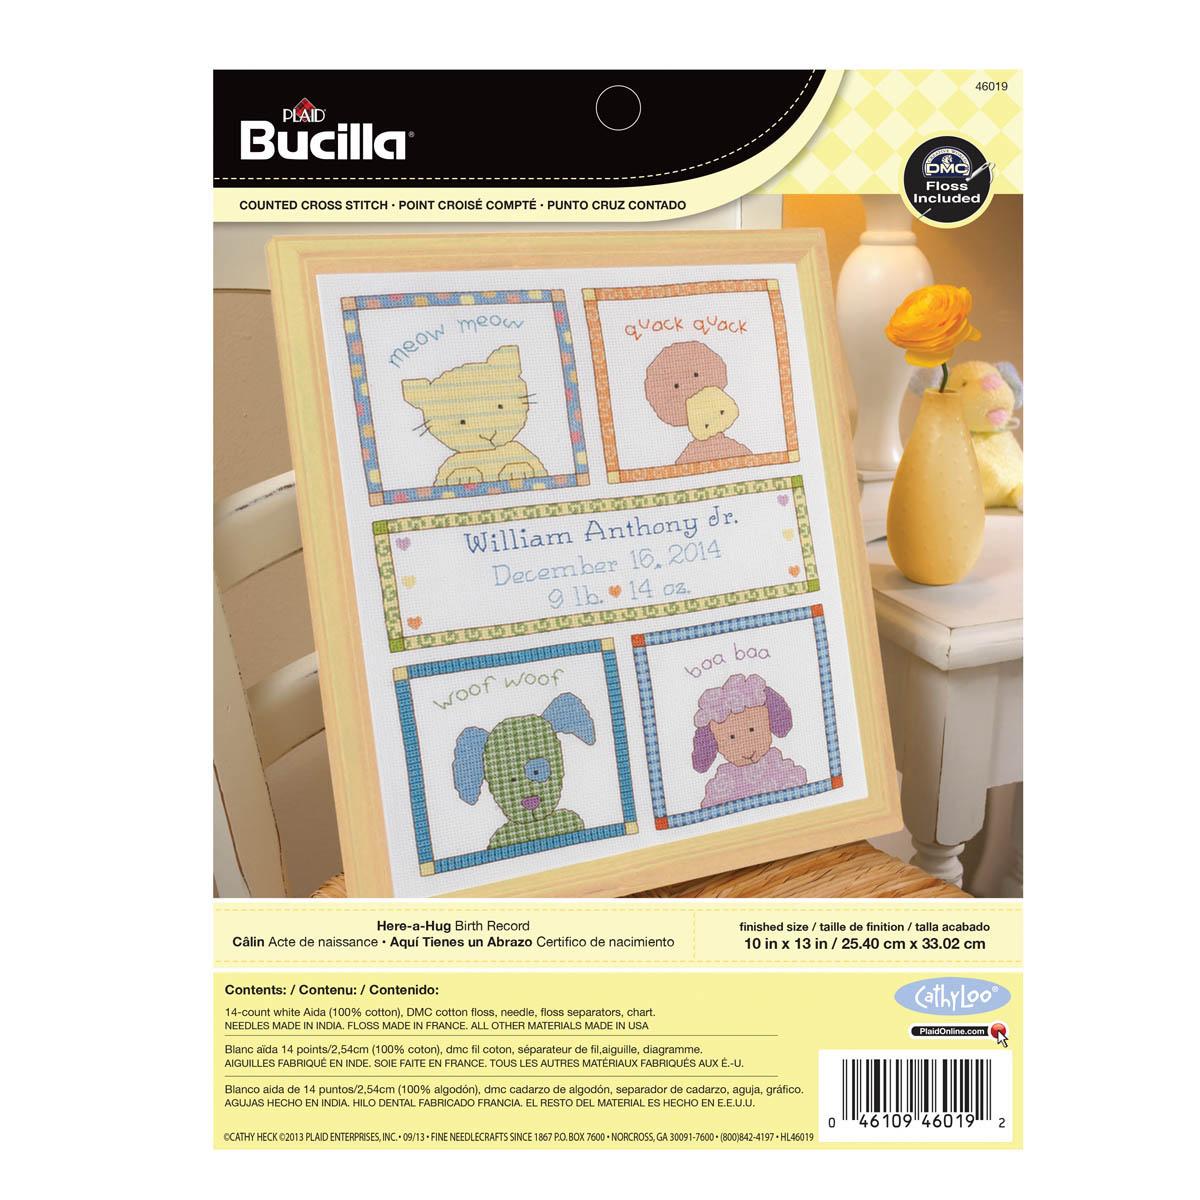 Bucilla ® Baby - Counted Cross Stitch - Crib Ensembles - Here-A-Hug - Birth Record Kit